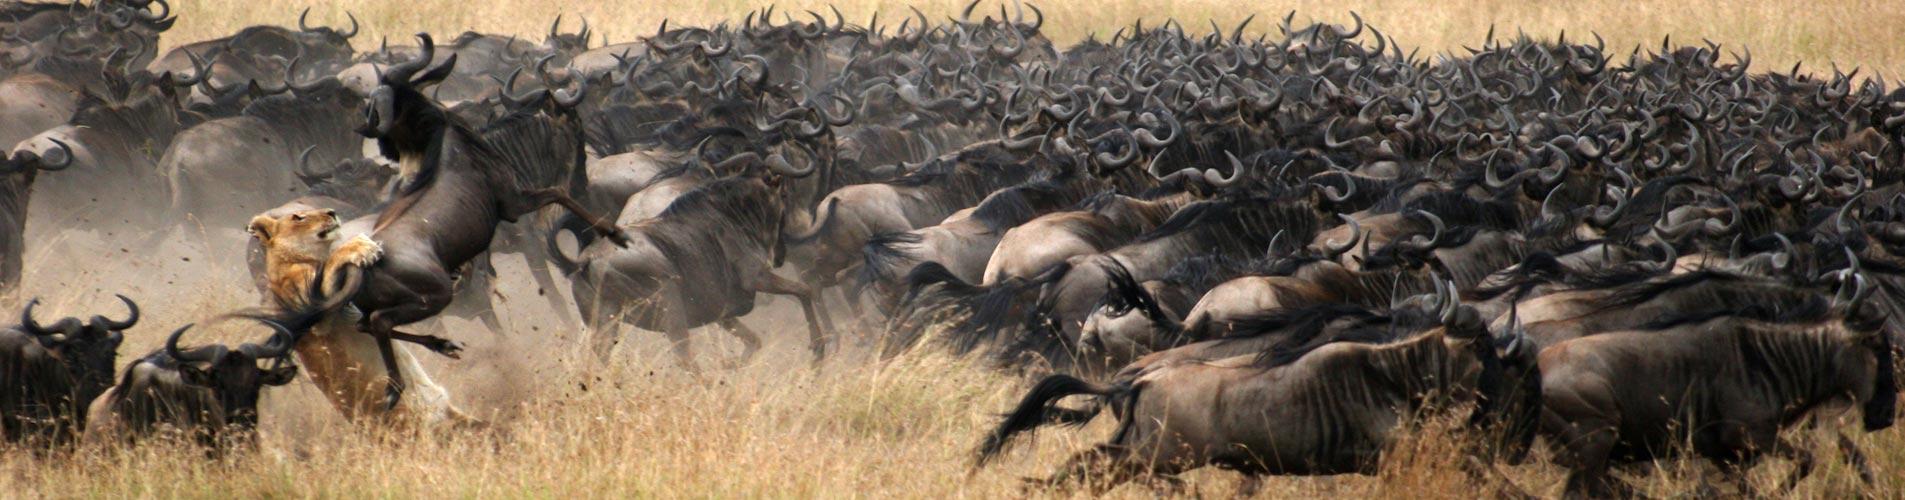 Kenya Safari Masai Mara Great Plains Conservation